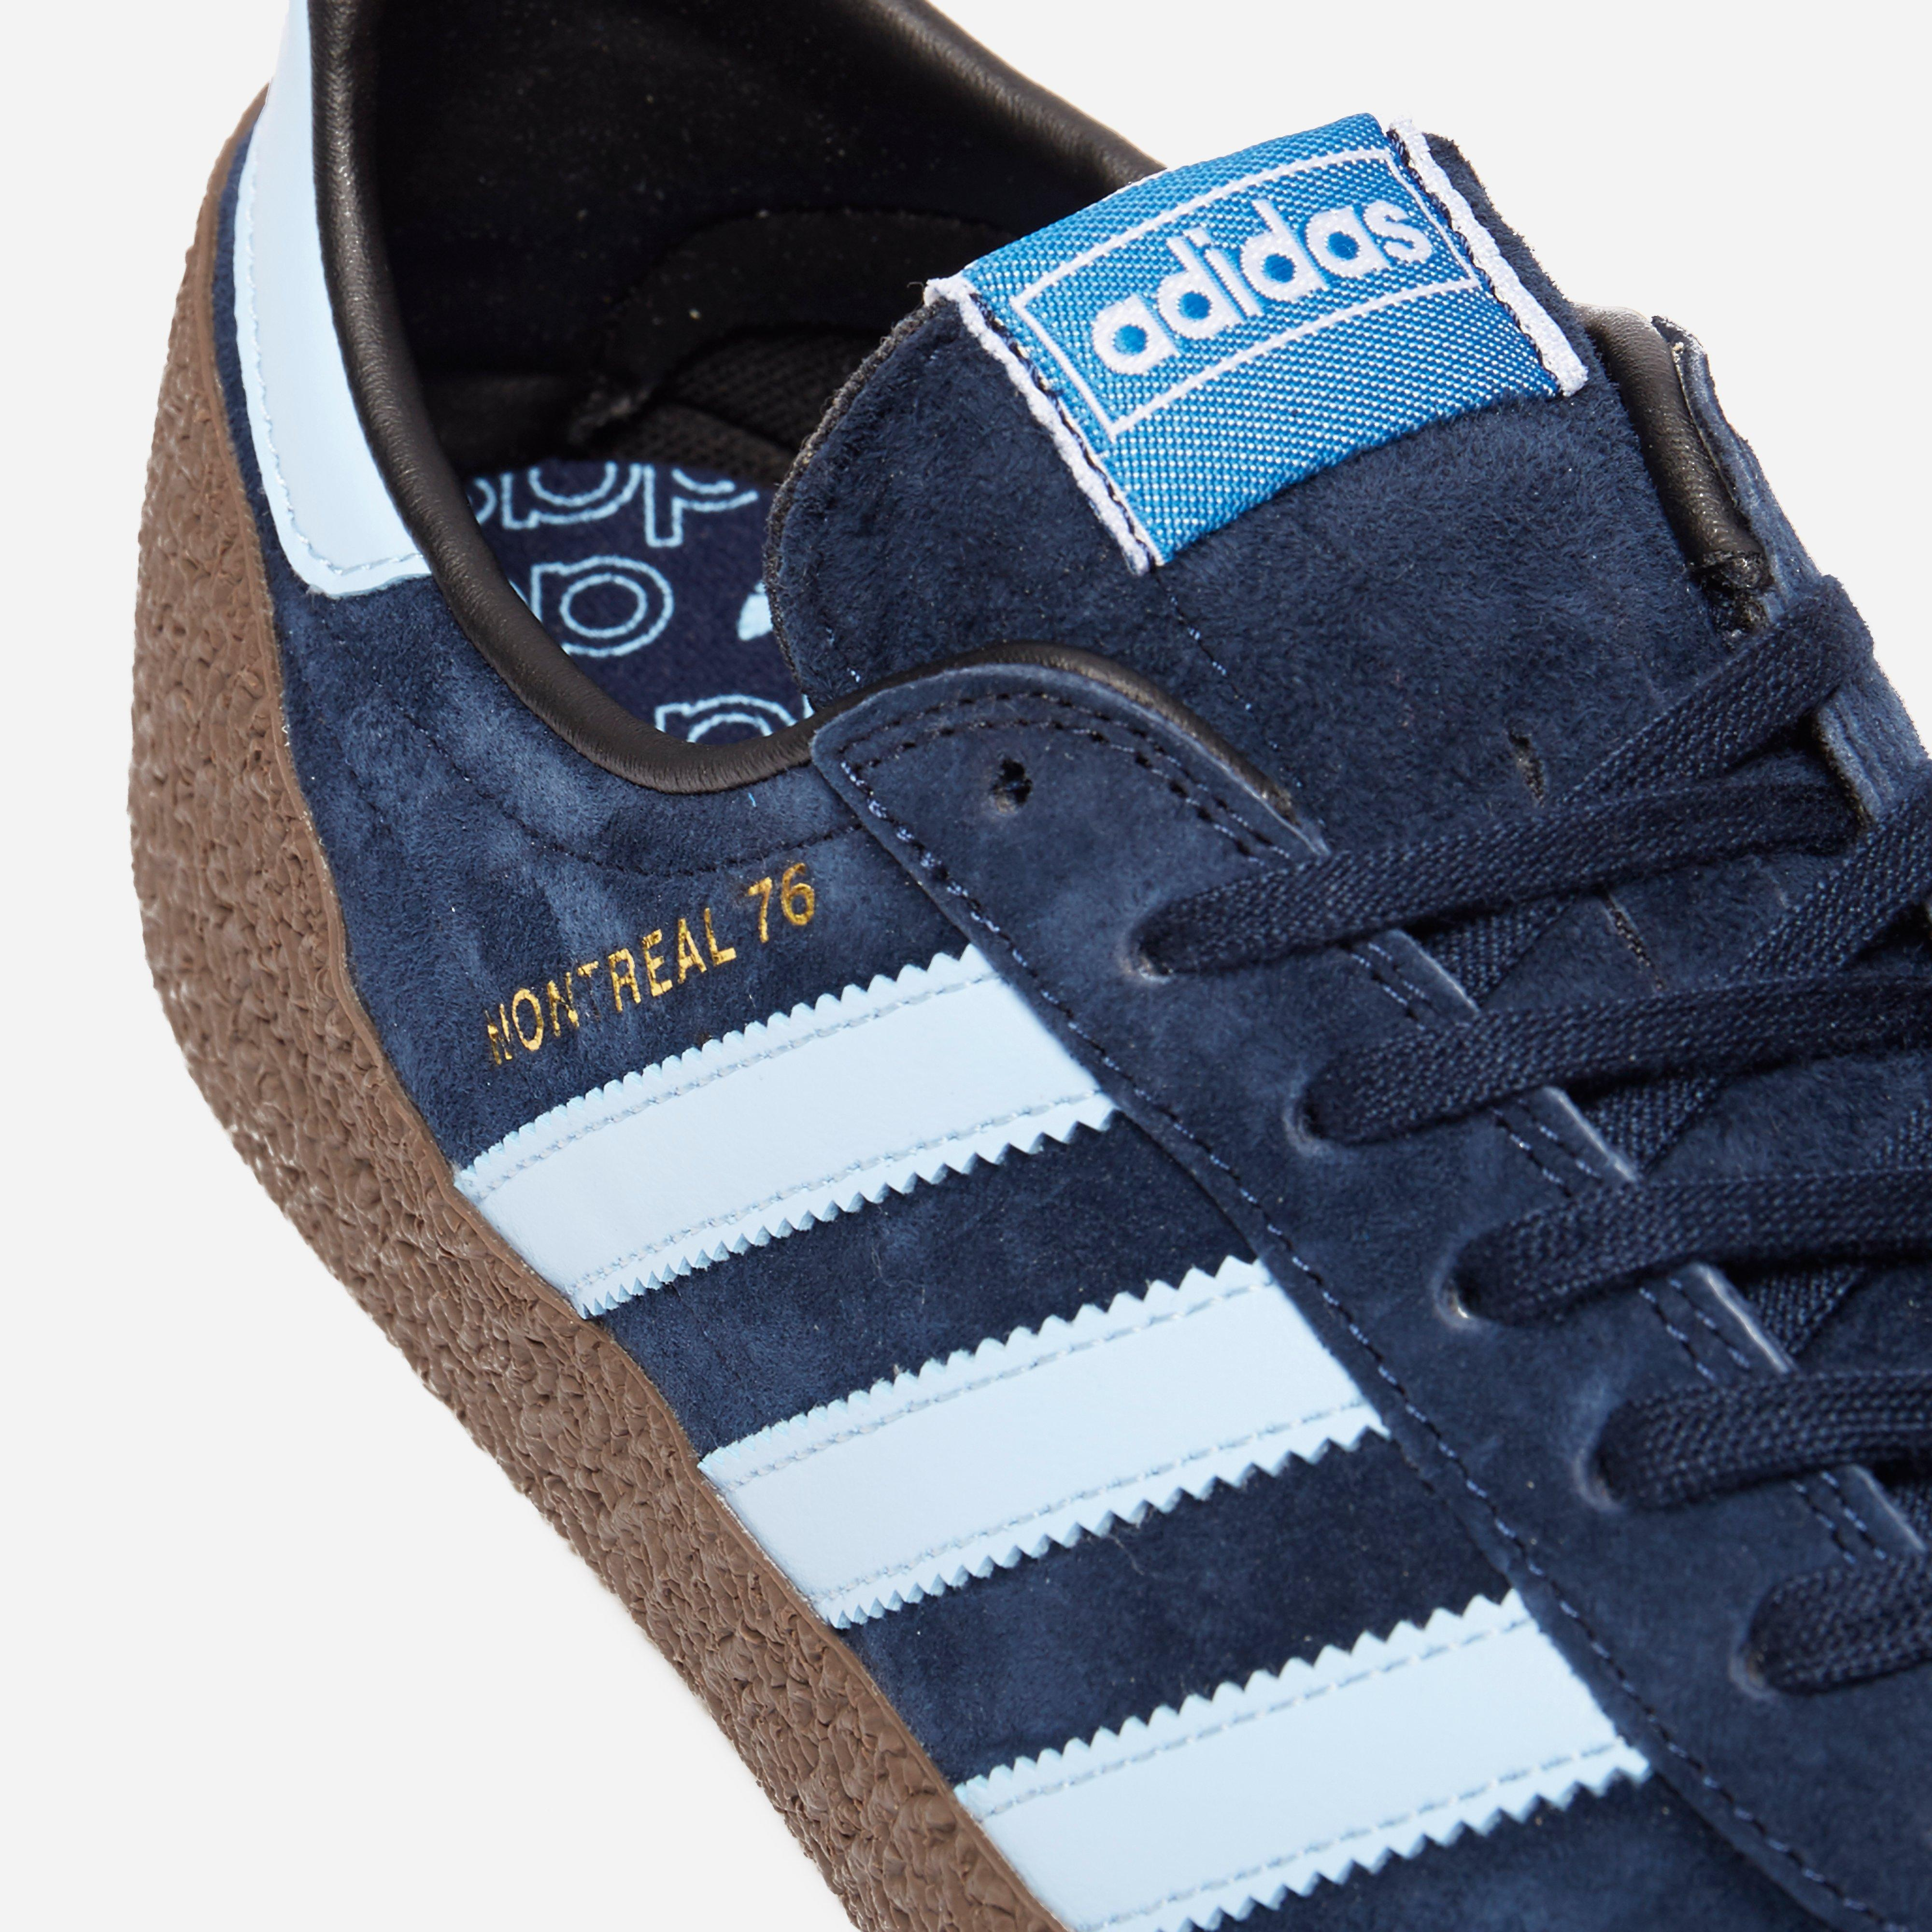 adidas Originals Suede Montreal 76 in Blue for Men